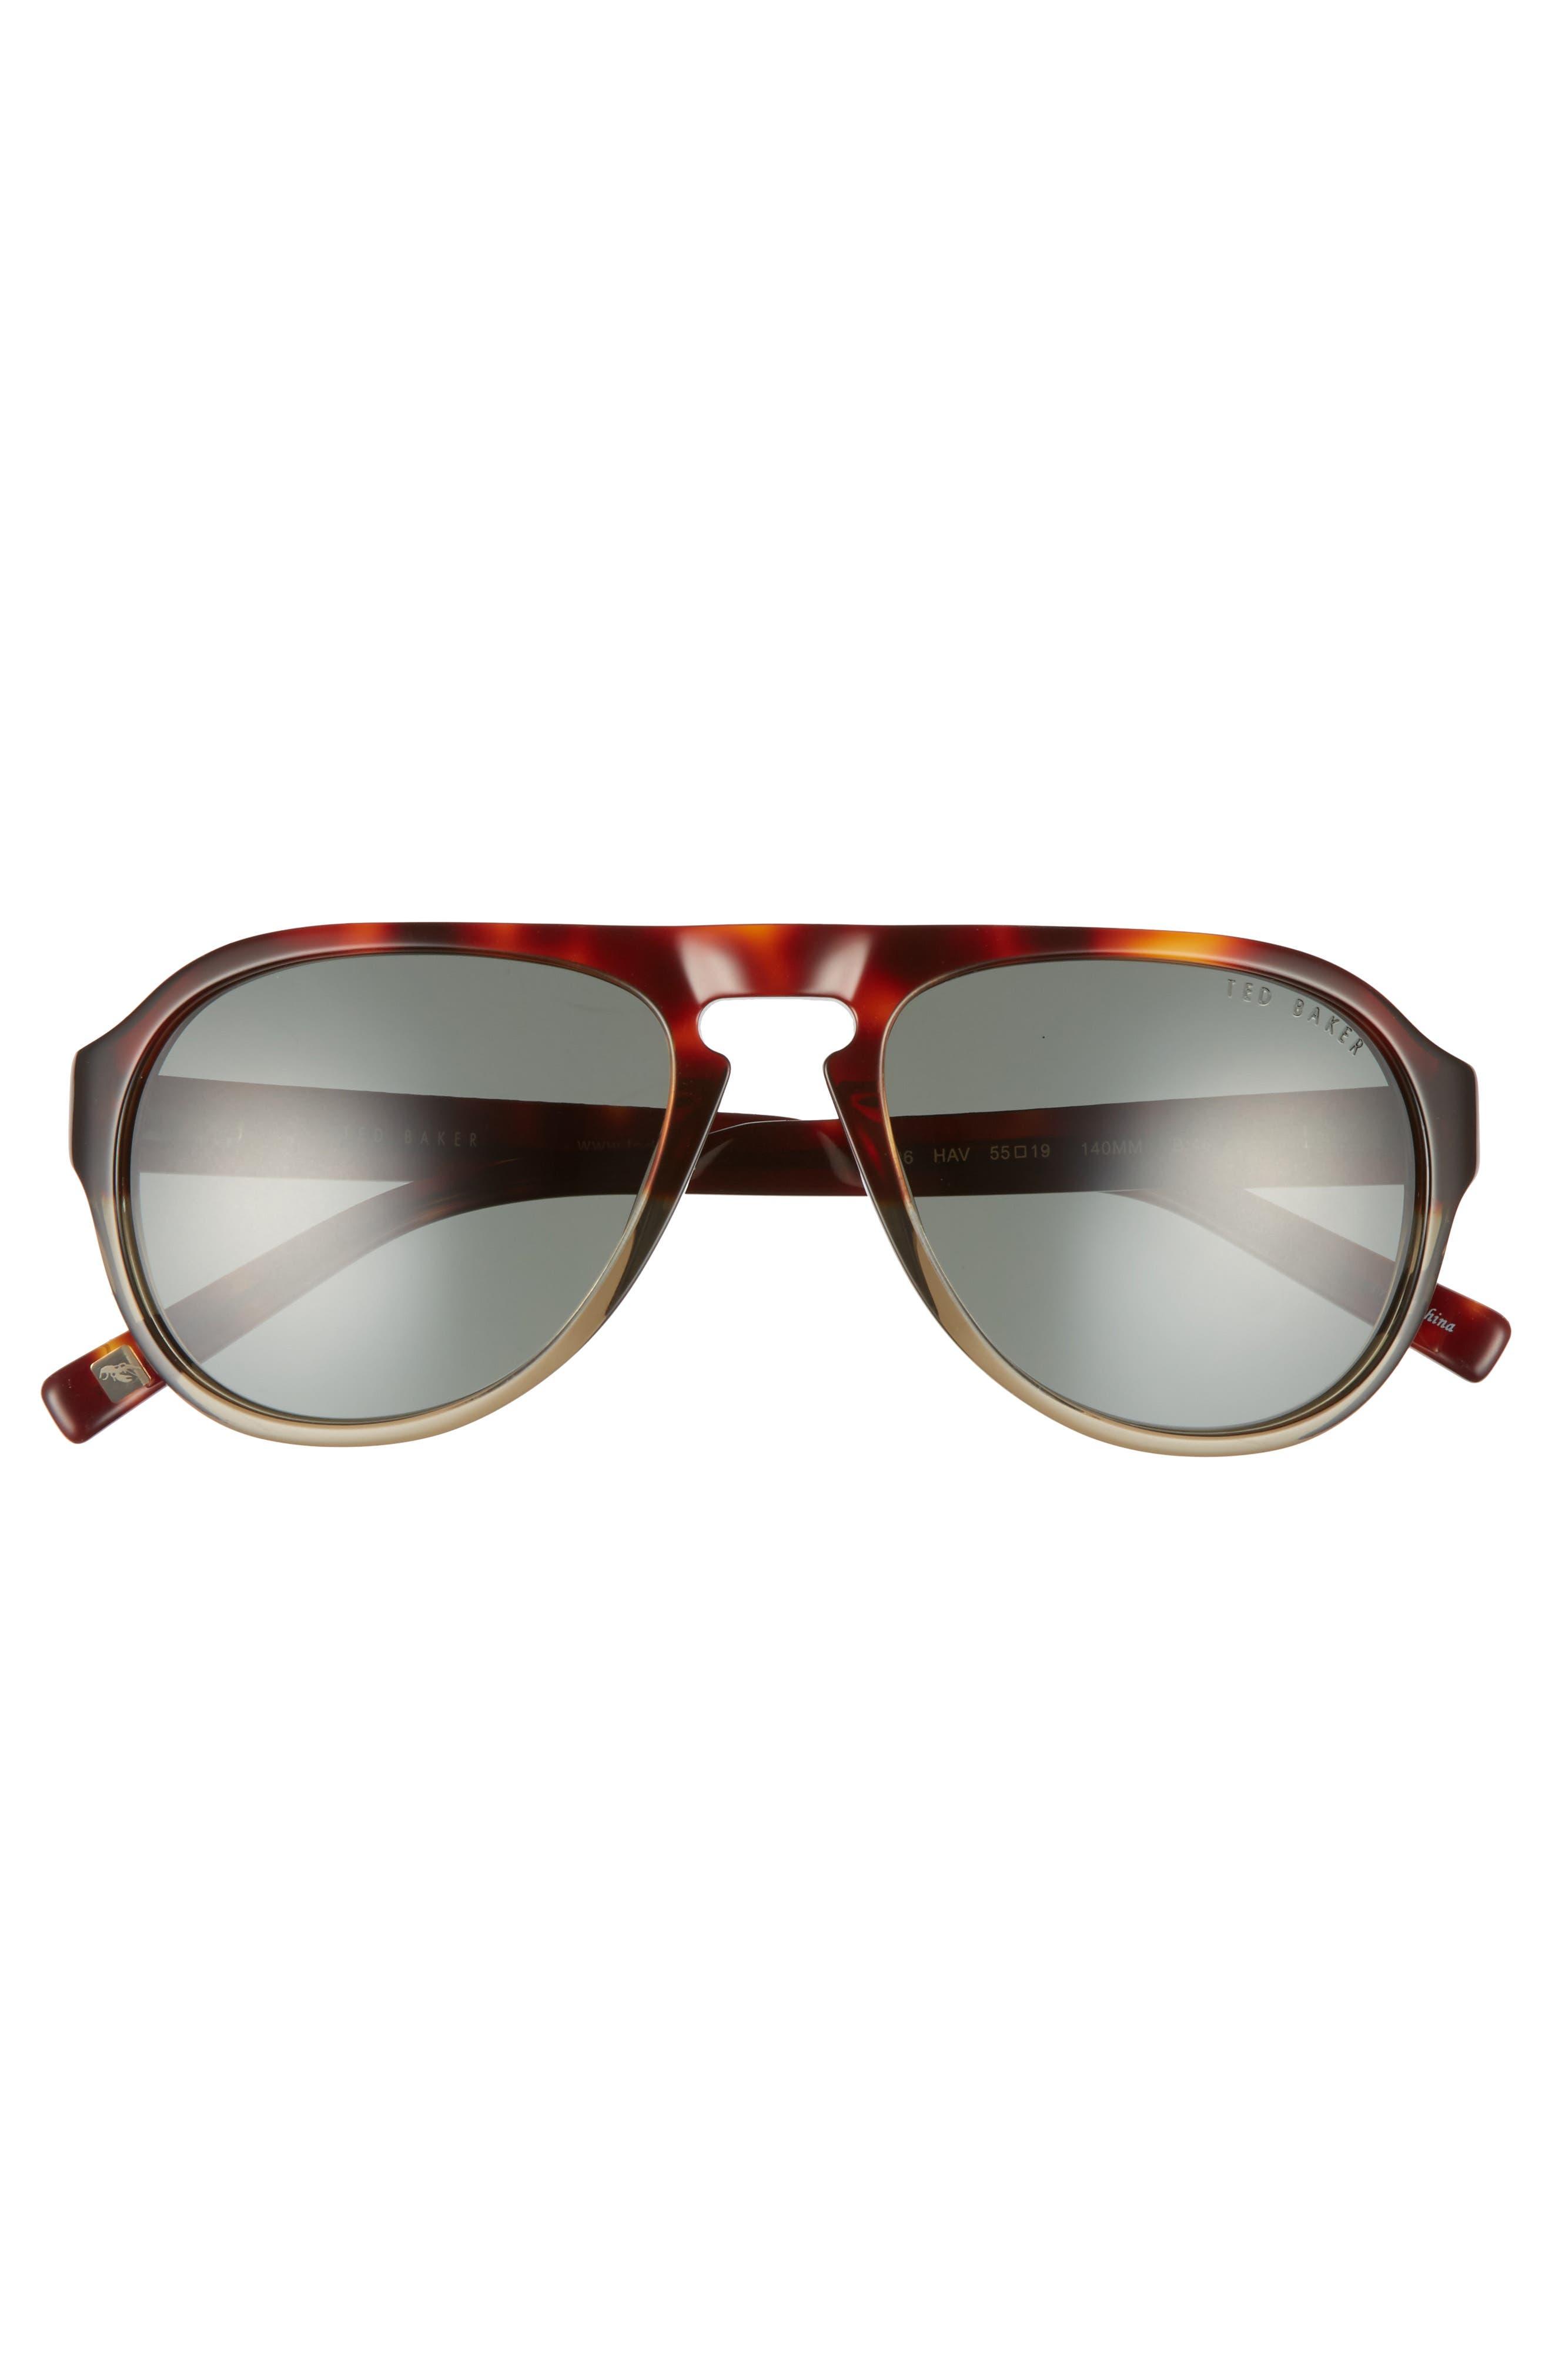 55mm Polarized Aviator Sunglasses,                             Alternate thumbnail 2, color,                             Tortoise Havana